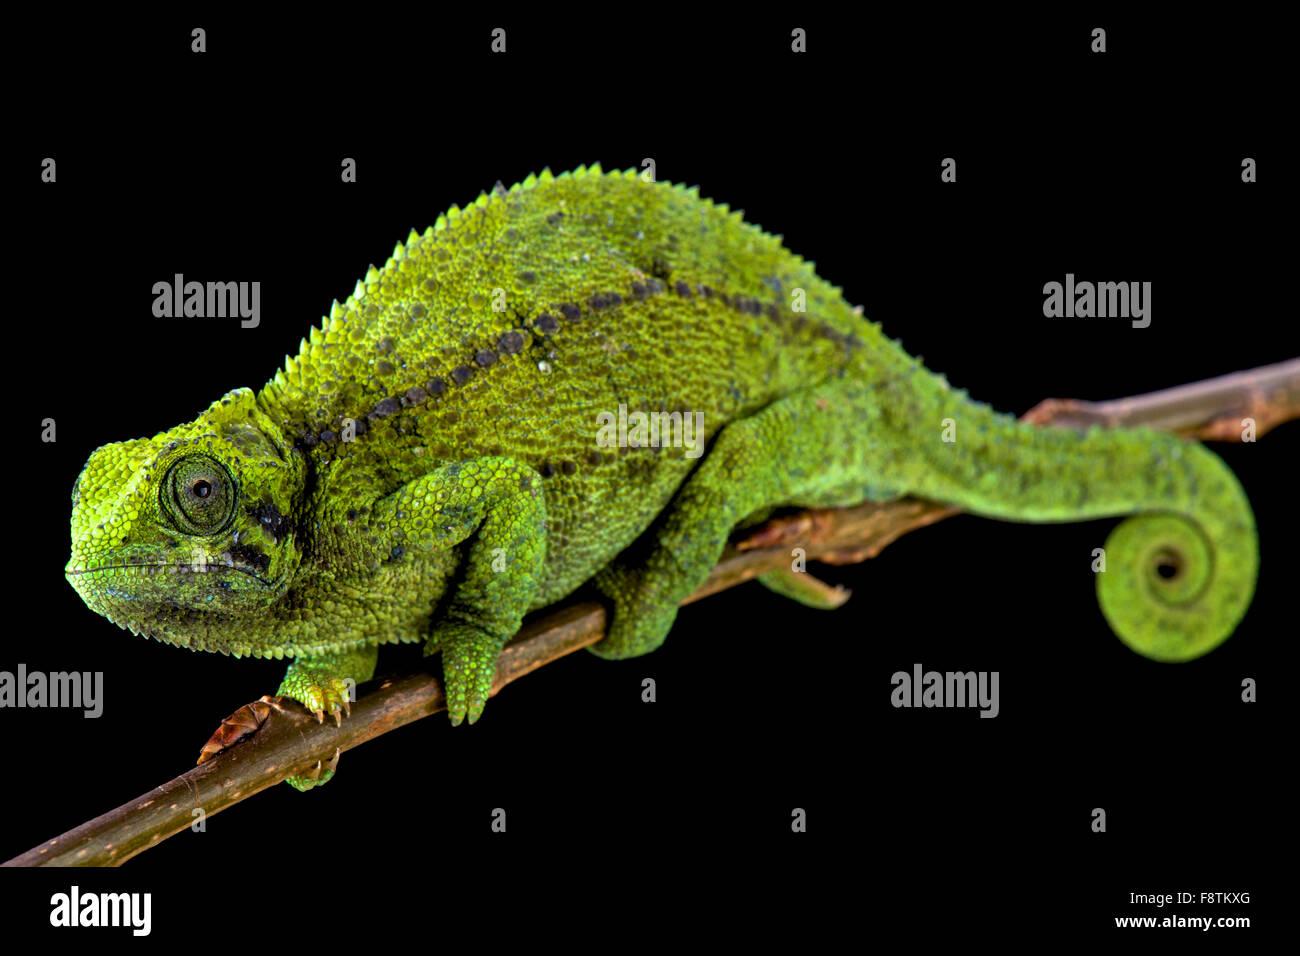 Tanzanian Montane Dwarf Chameleon (Trioceros sternfeldi) female - Stock Image